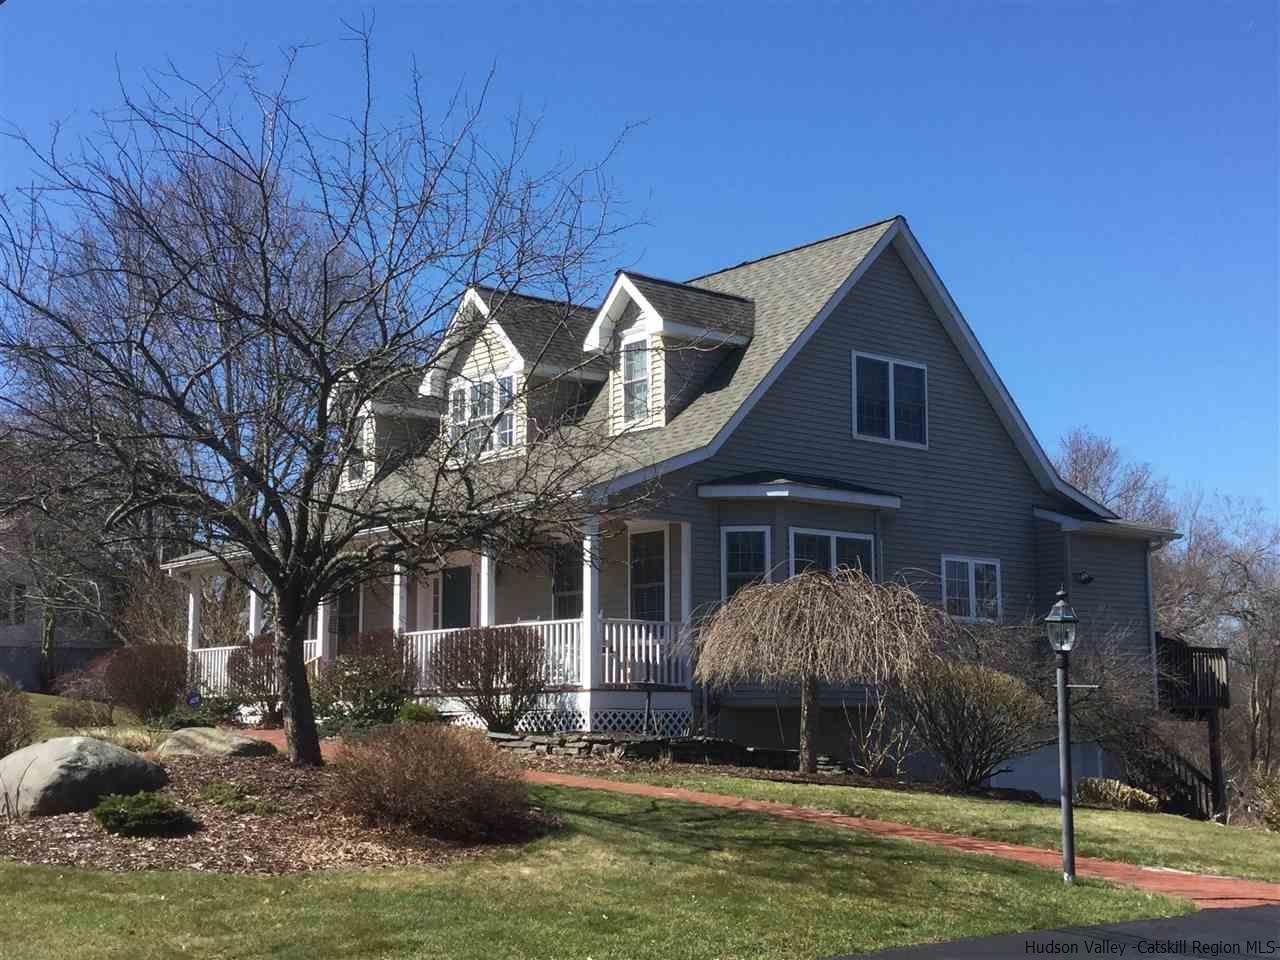 186 High Meadows Road, Walden, NY 12586